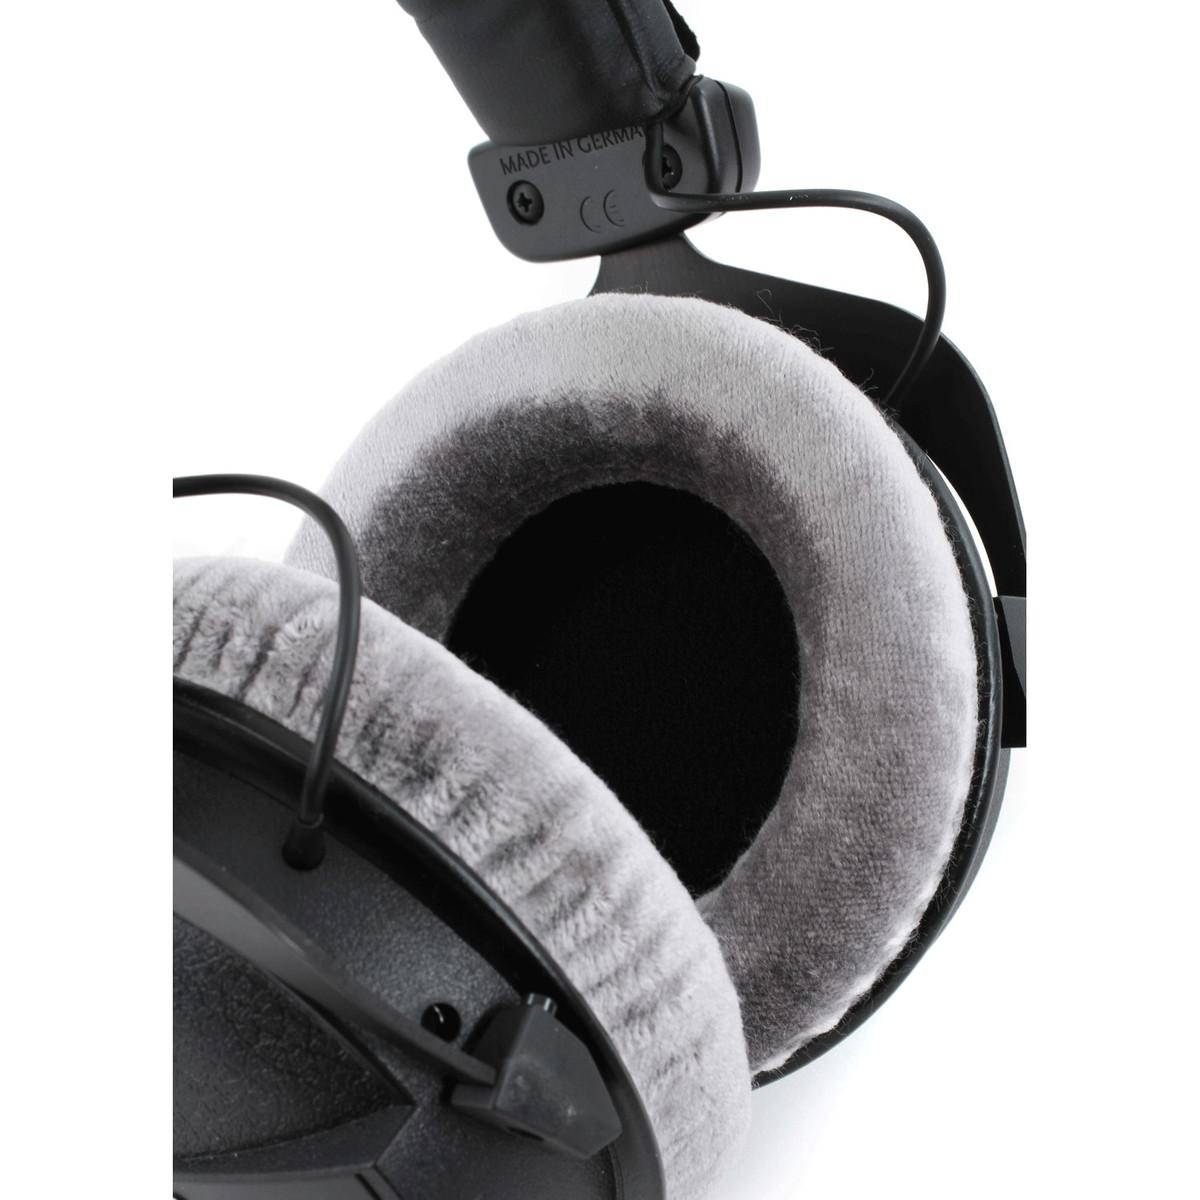 3673585423f Beyerdynamic DT 770 Pro Headphones, 80 Ohm - Ex Demo at Gear4music